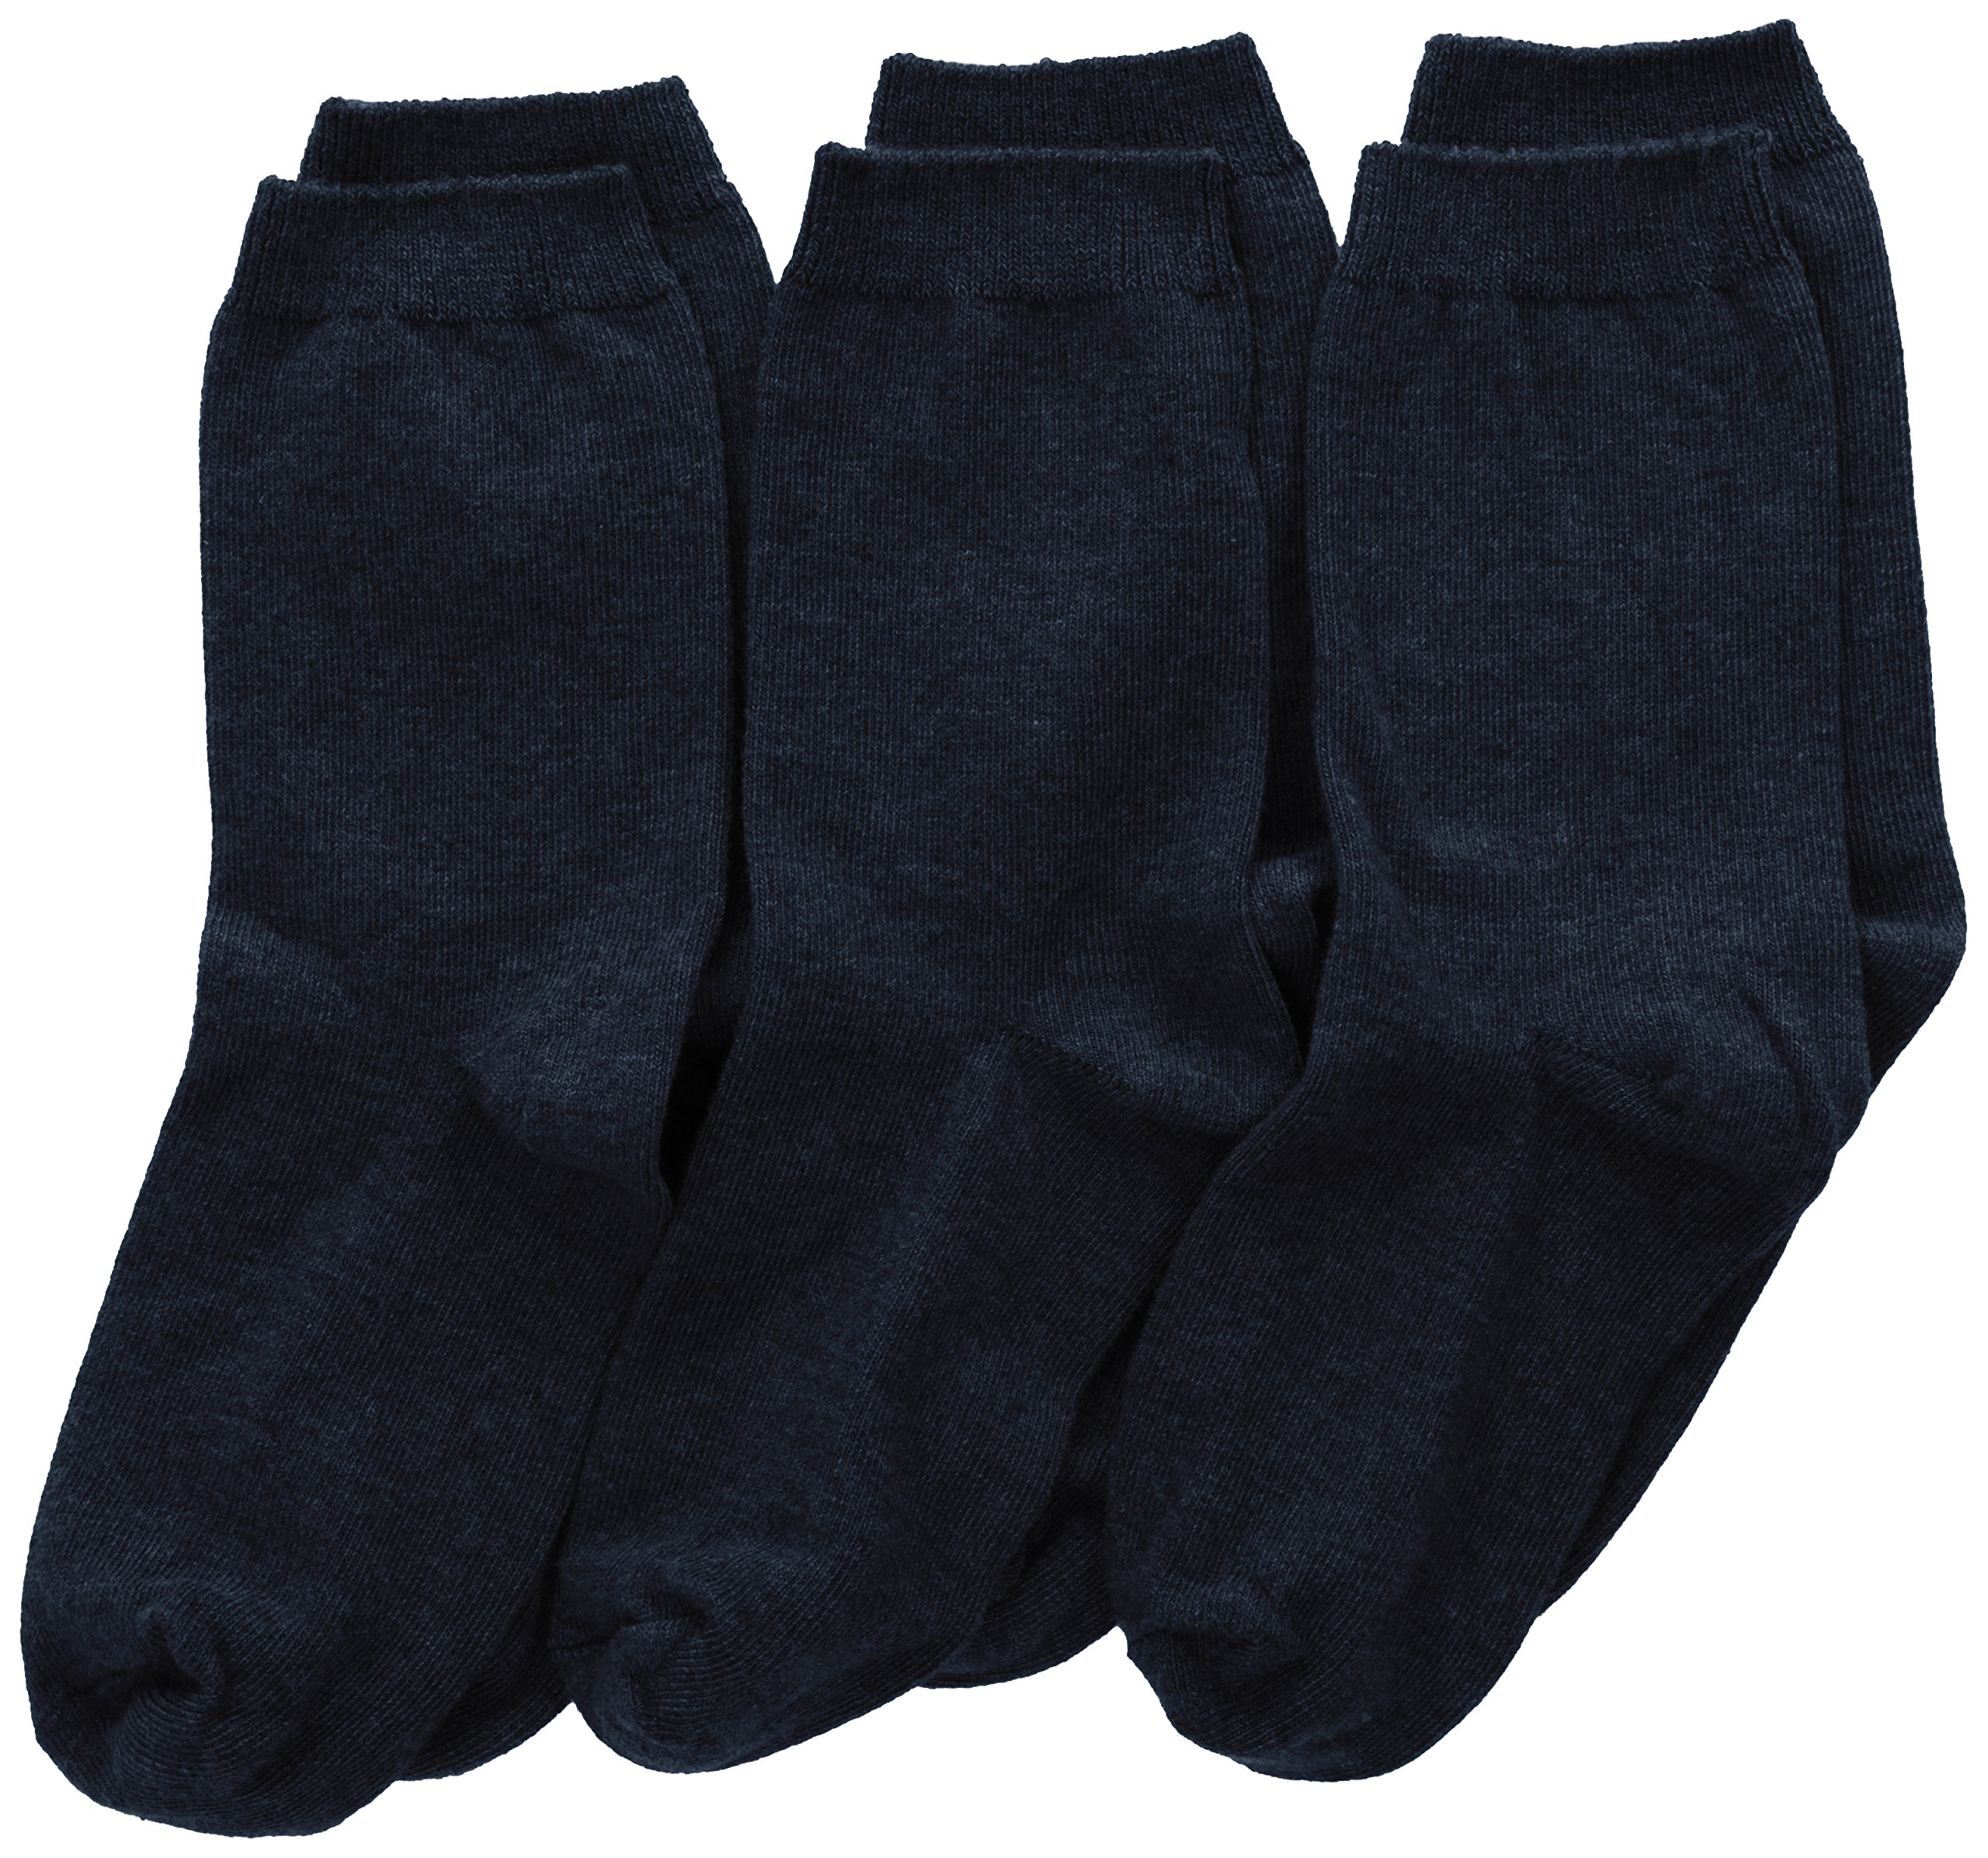 Jefferies Socks Big Boys' School Uniform Cotton Crew (Pack of 3), Navy, Large by Jefferies Socks (Image #1)